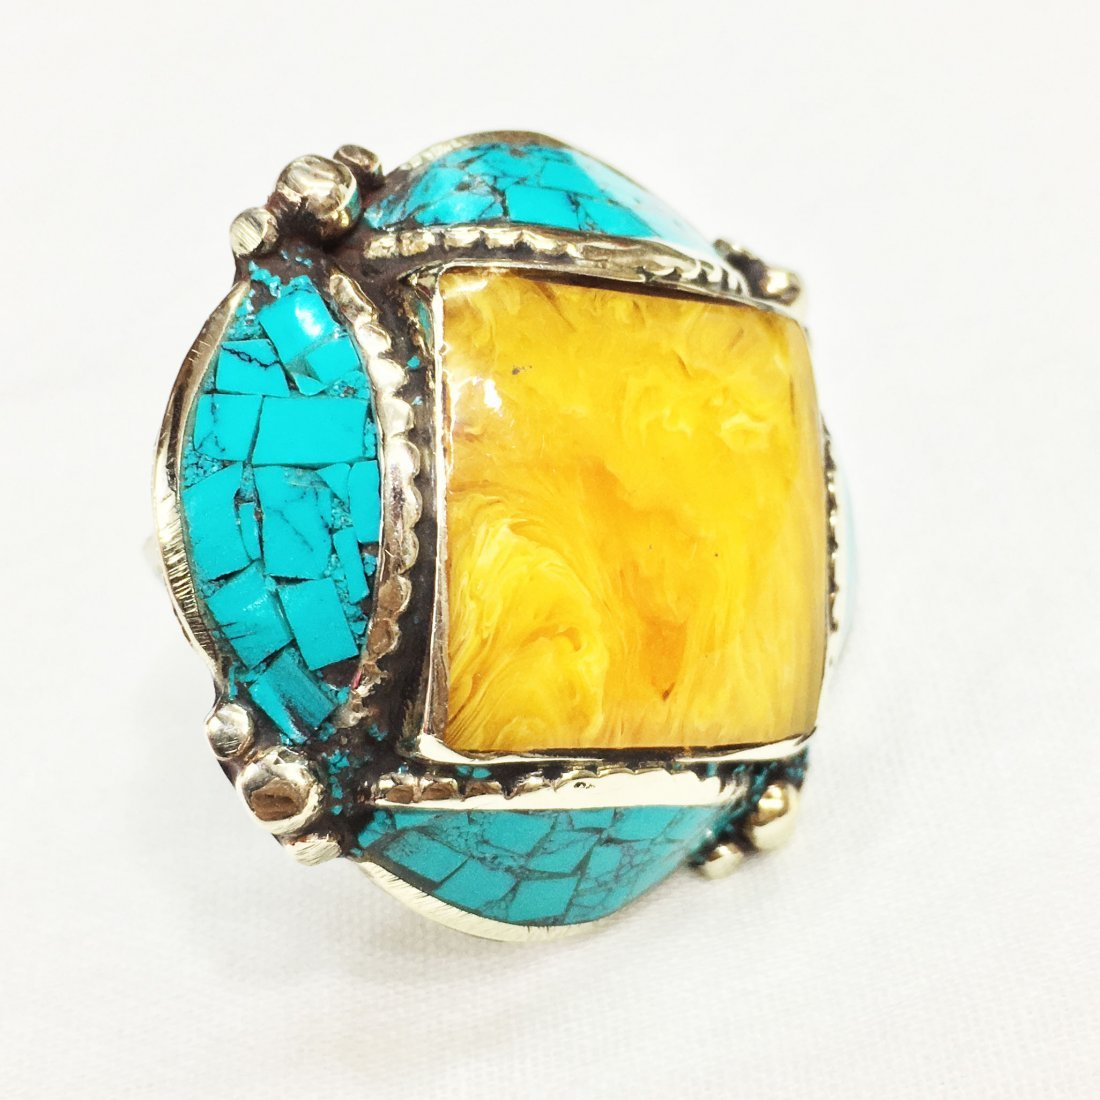 Free Size - Turquoise & Amber Tibetan Silver Ring - 3